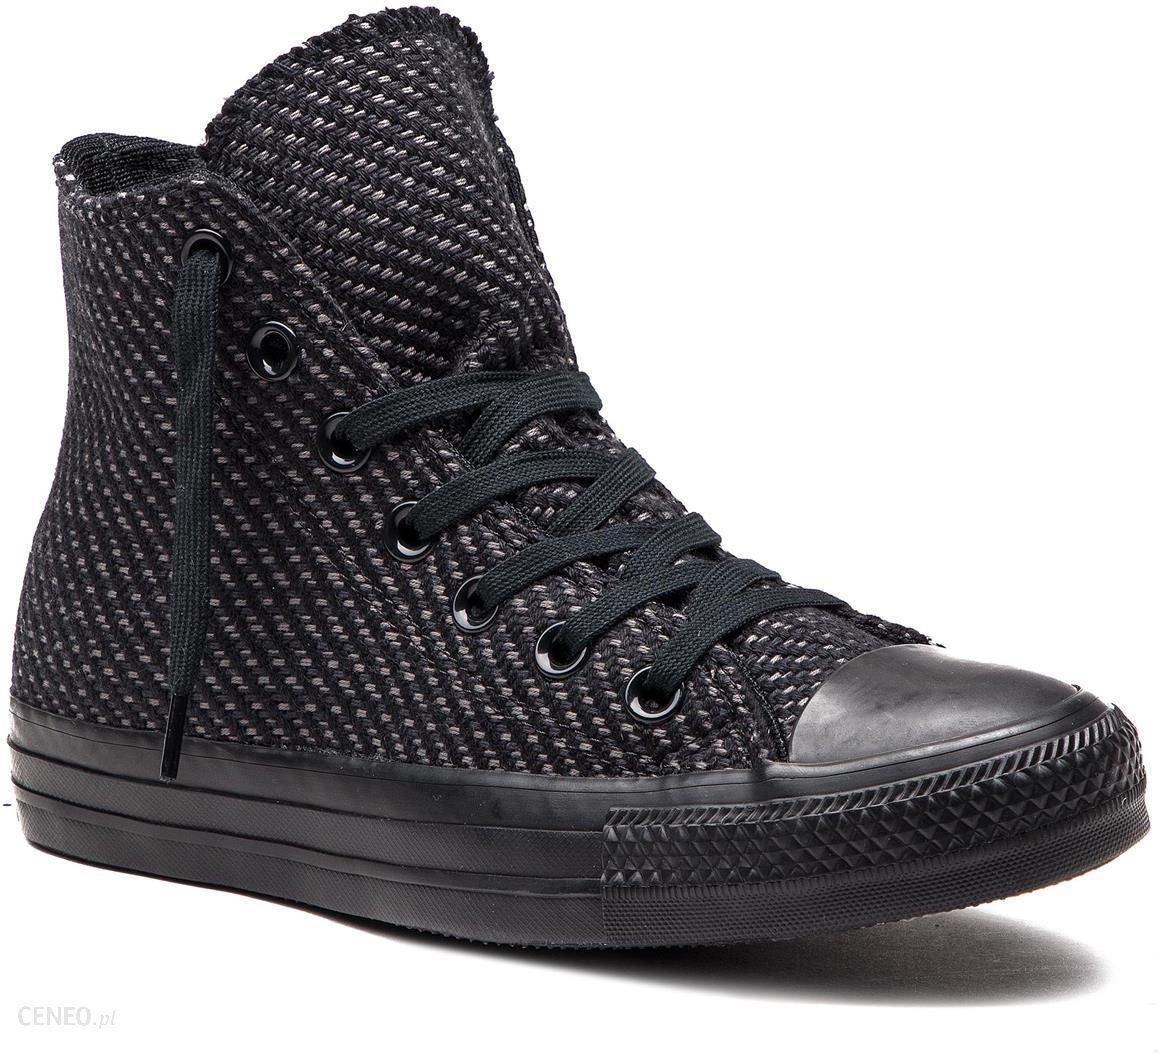 e3d0a18522806 Trampki CONVERSE - Ctas Hi 562490C Black/Black/Black - Ceny i opinie ...